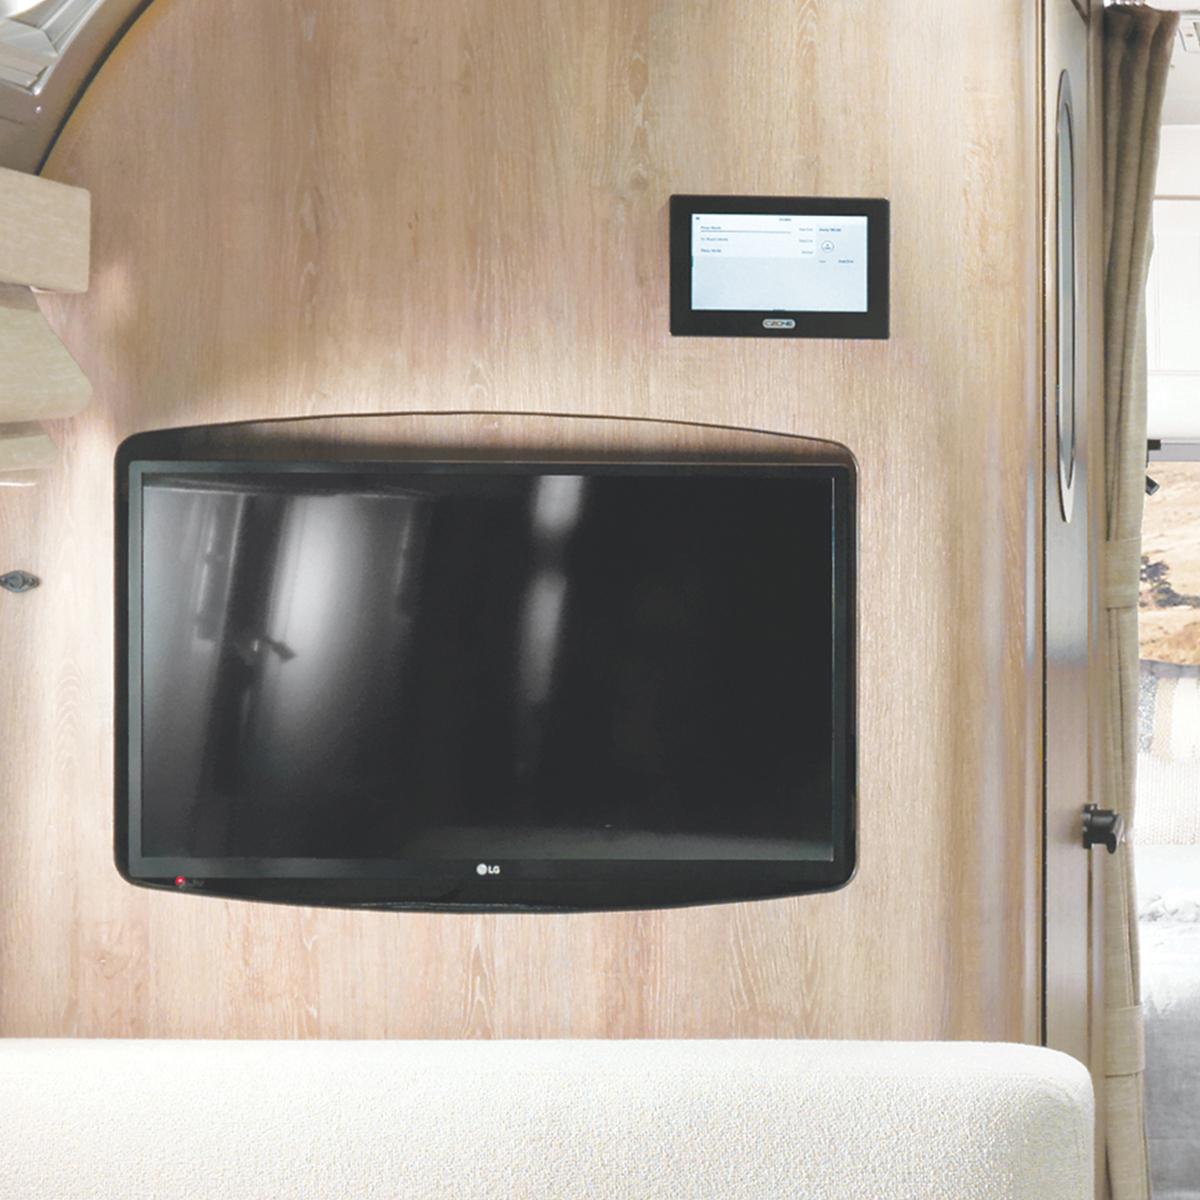 Airstream-Smart-Control-Pottery-Barn-SE